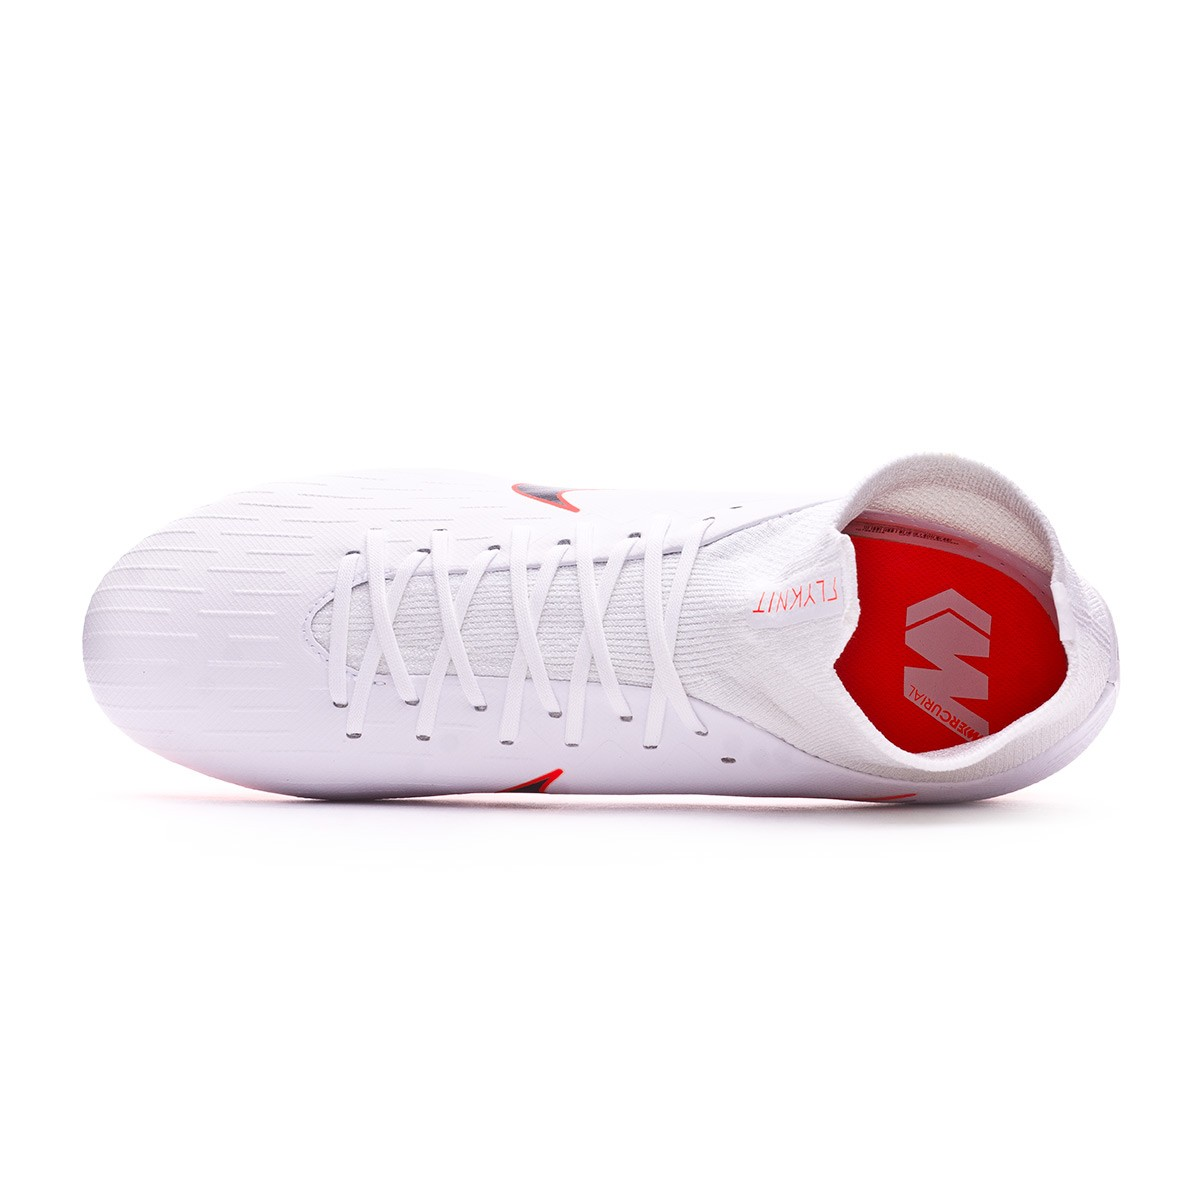 2da26f1a672 Football Boots Nike Mercurial Superfly VI Pro FG White-Metallic cool grey-Total  orange - Tienda de fútbol Fútbol Emotion